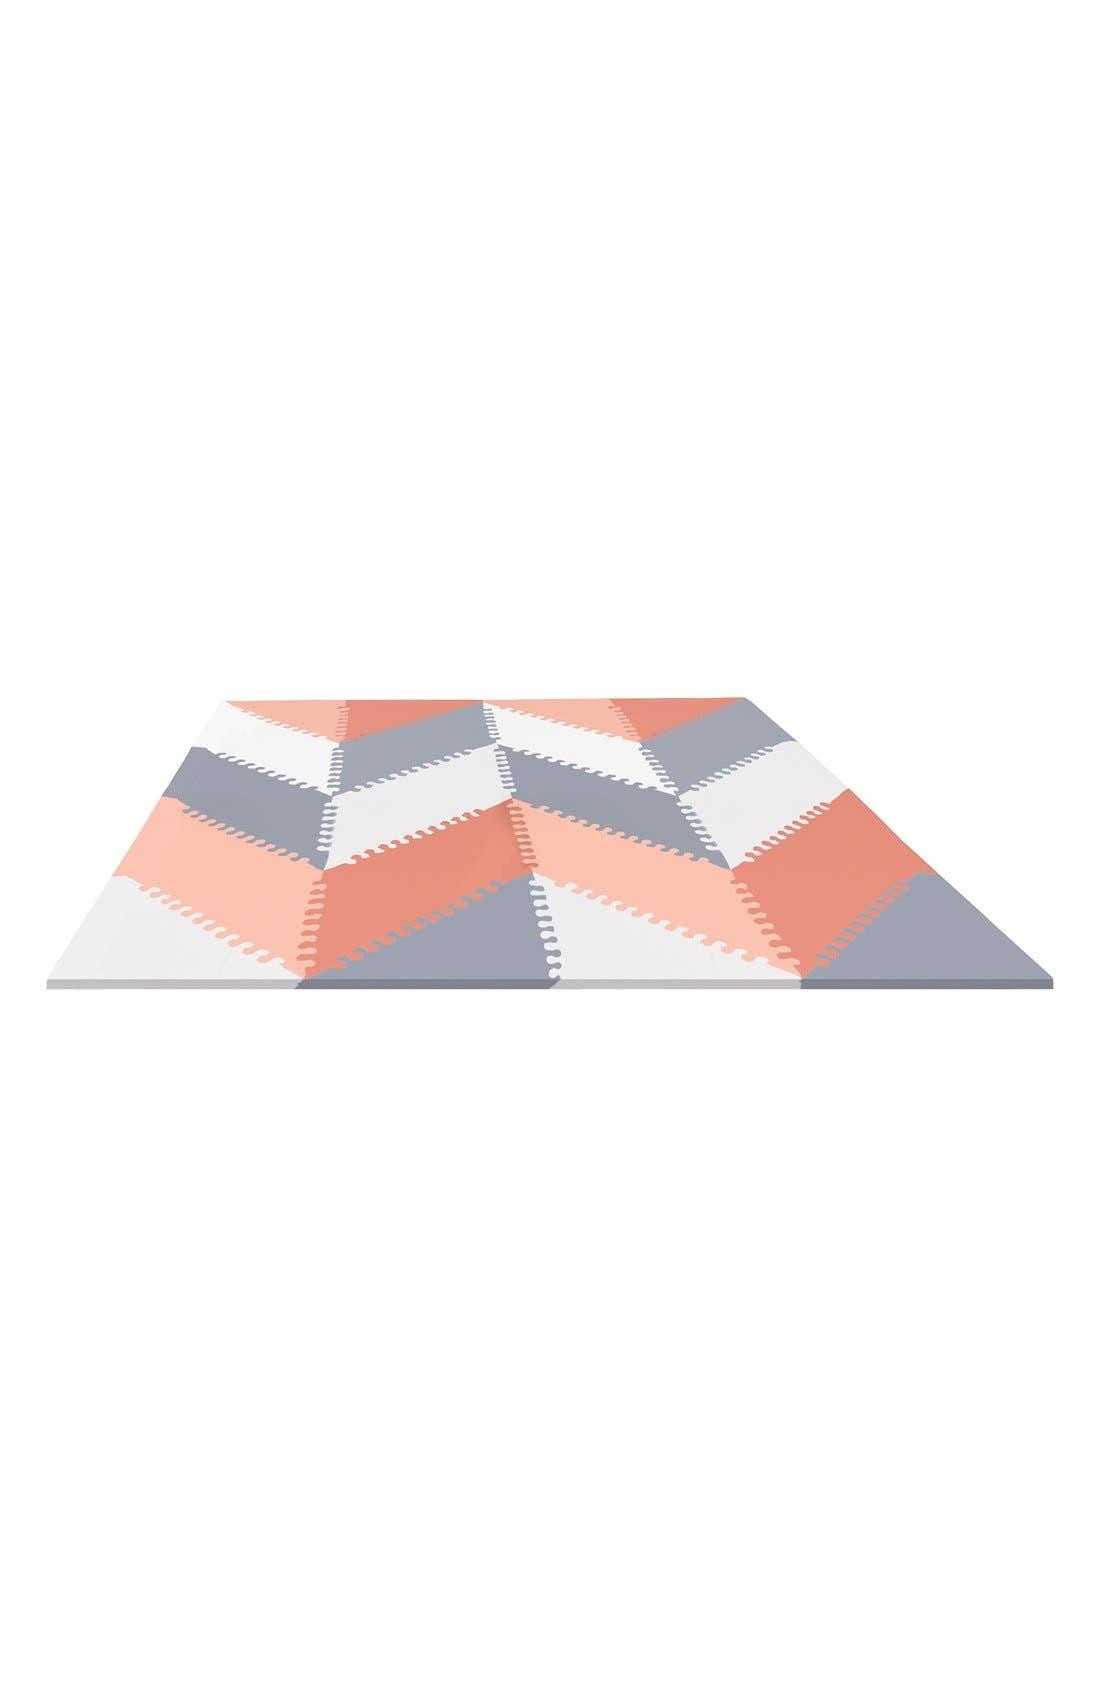 Skip Hop 'Playspot' Floor Tiles